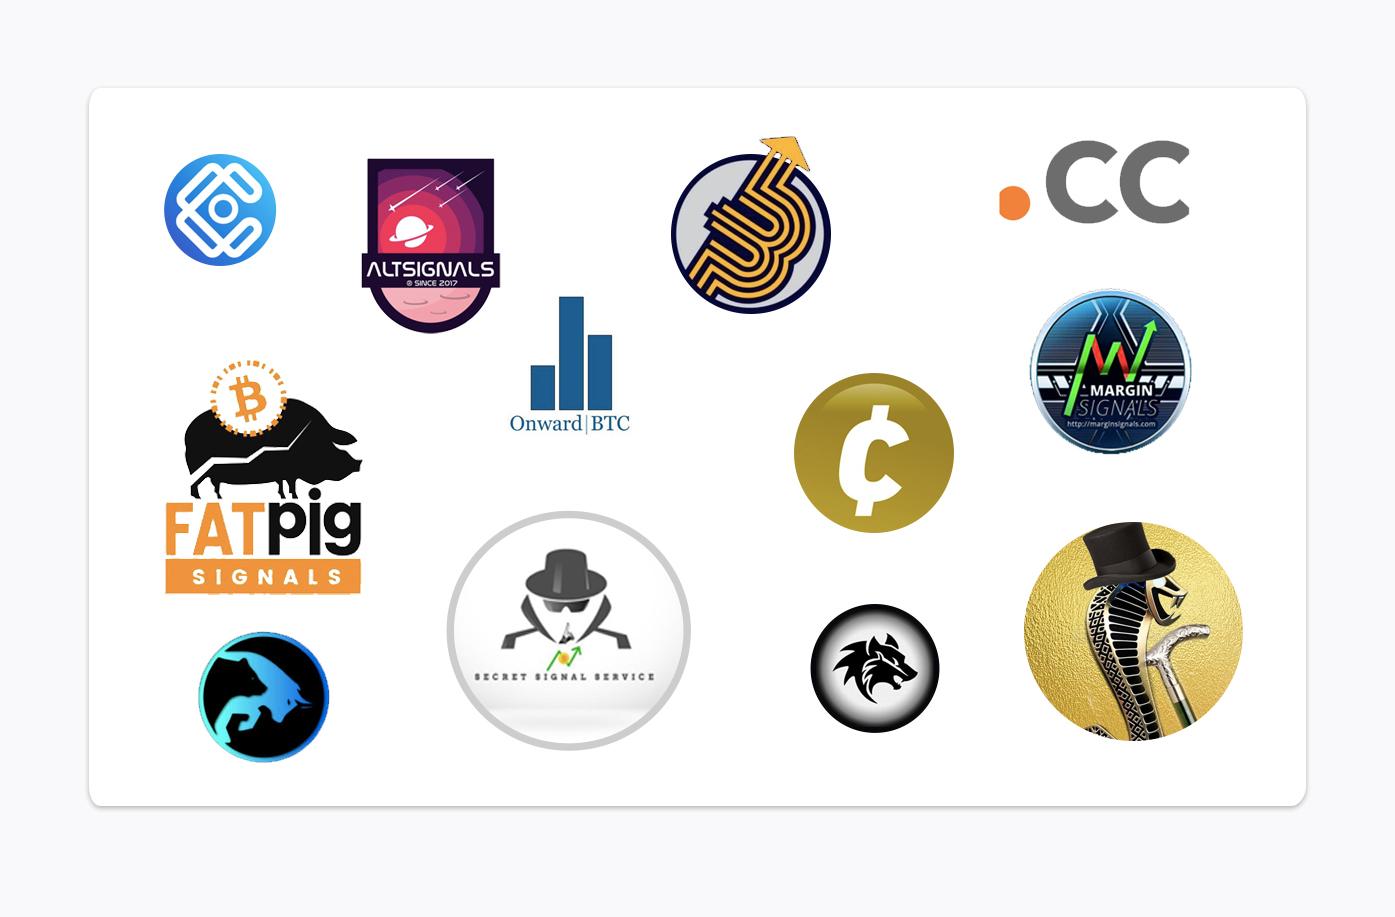 best BitMEX signals providers